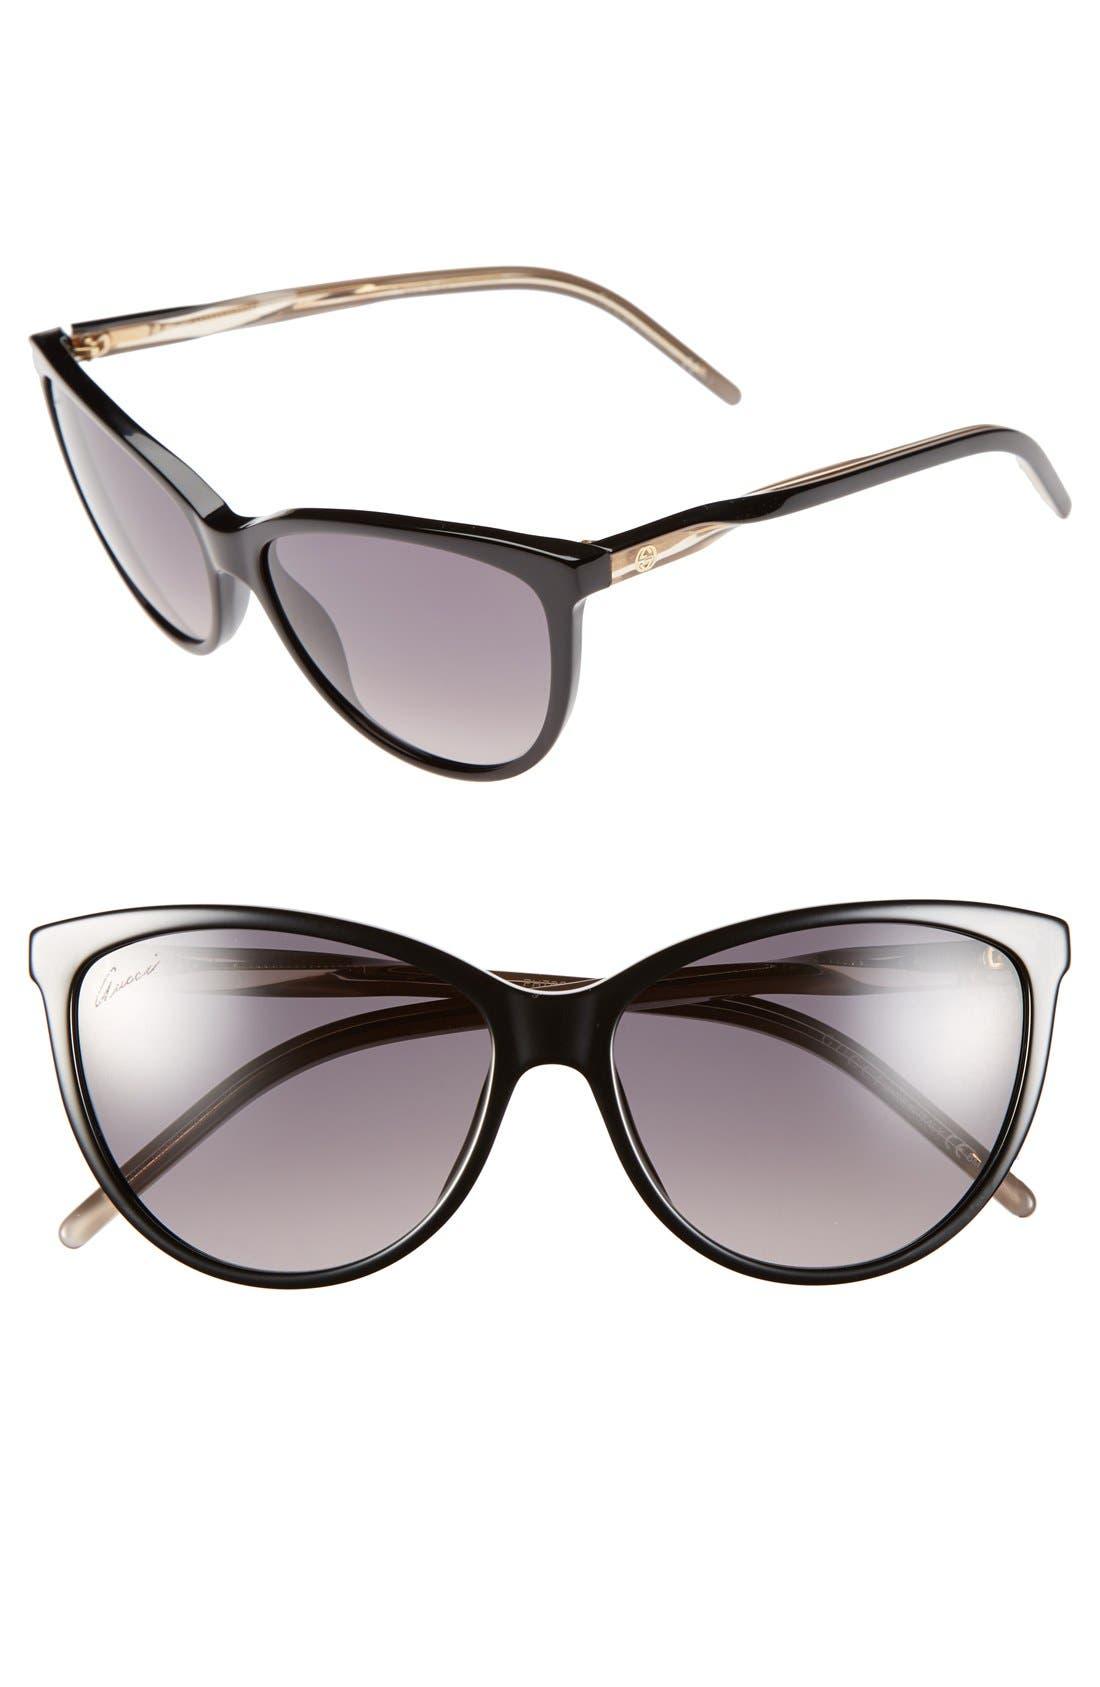 Main Image - Gucci 58mm Cat Eye Sunglasses